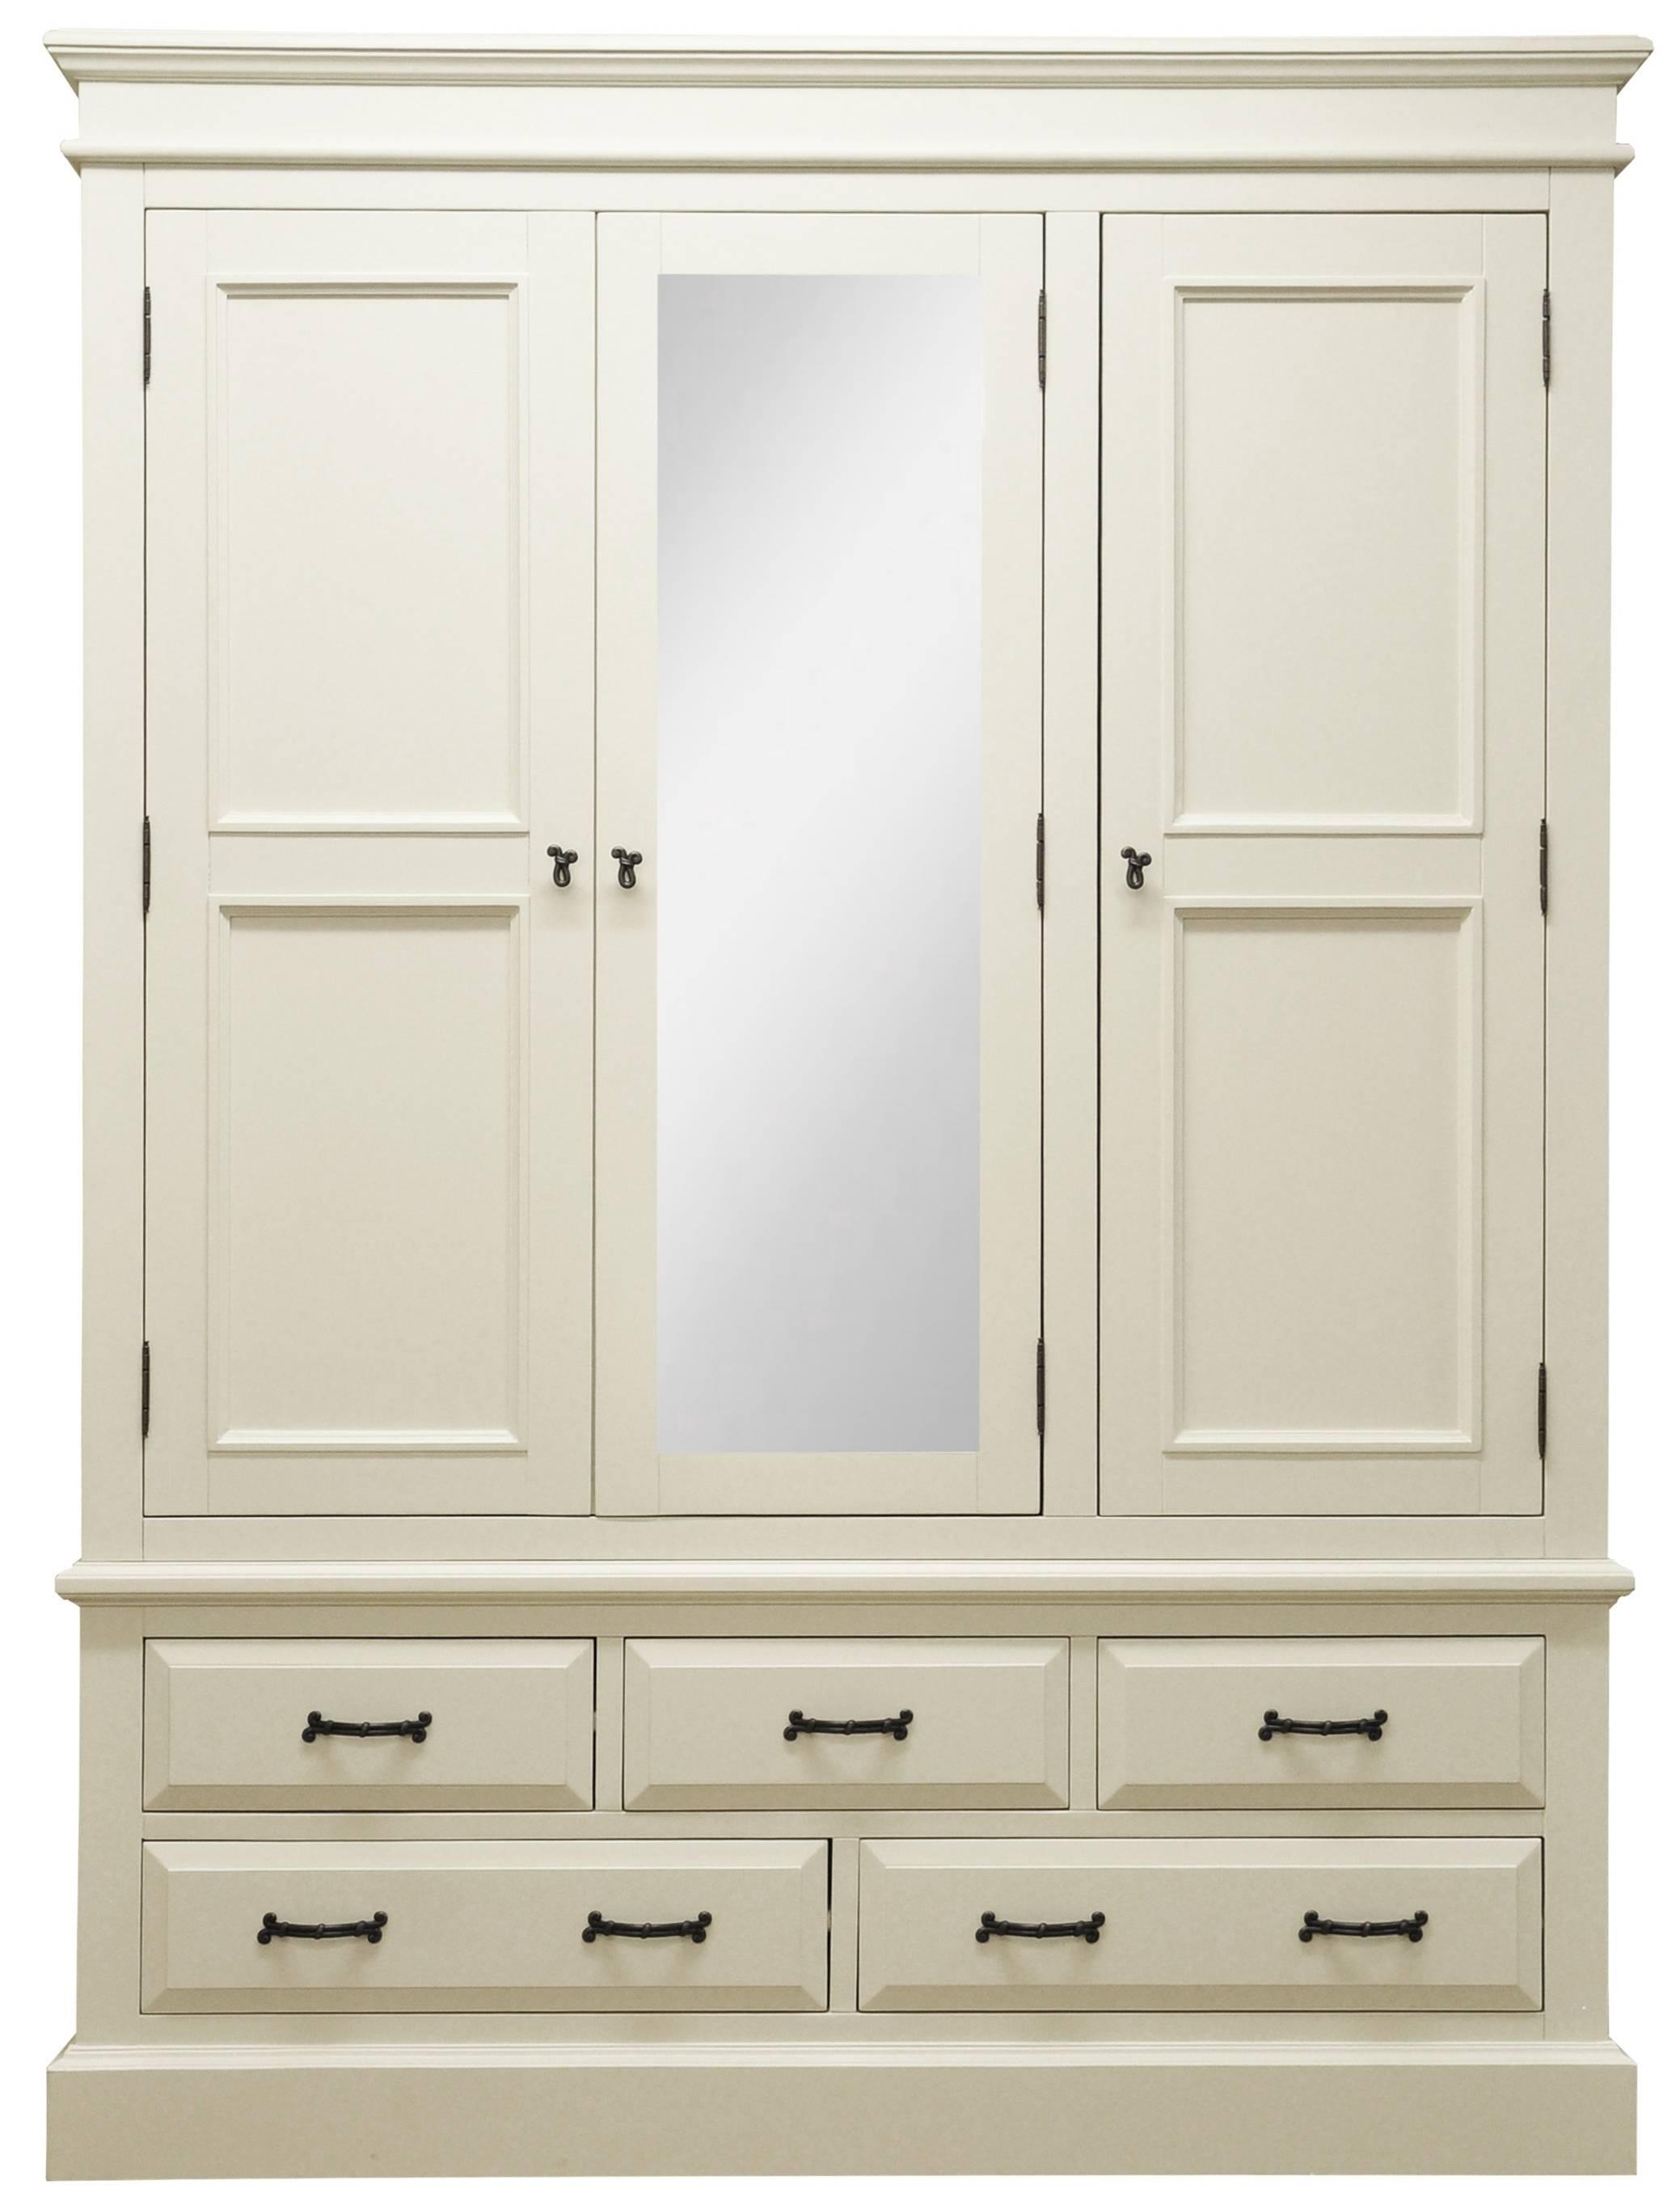 Wardrobes : Henleaze 5 Drawer Painted Wardrobe With Mirrorhenleaze in Wardrobes 3 Door With Mirror (Image 15 of 15)